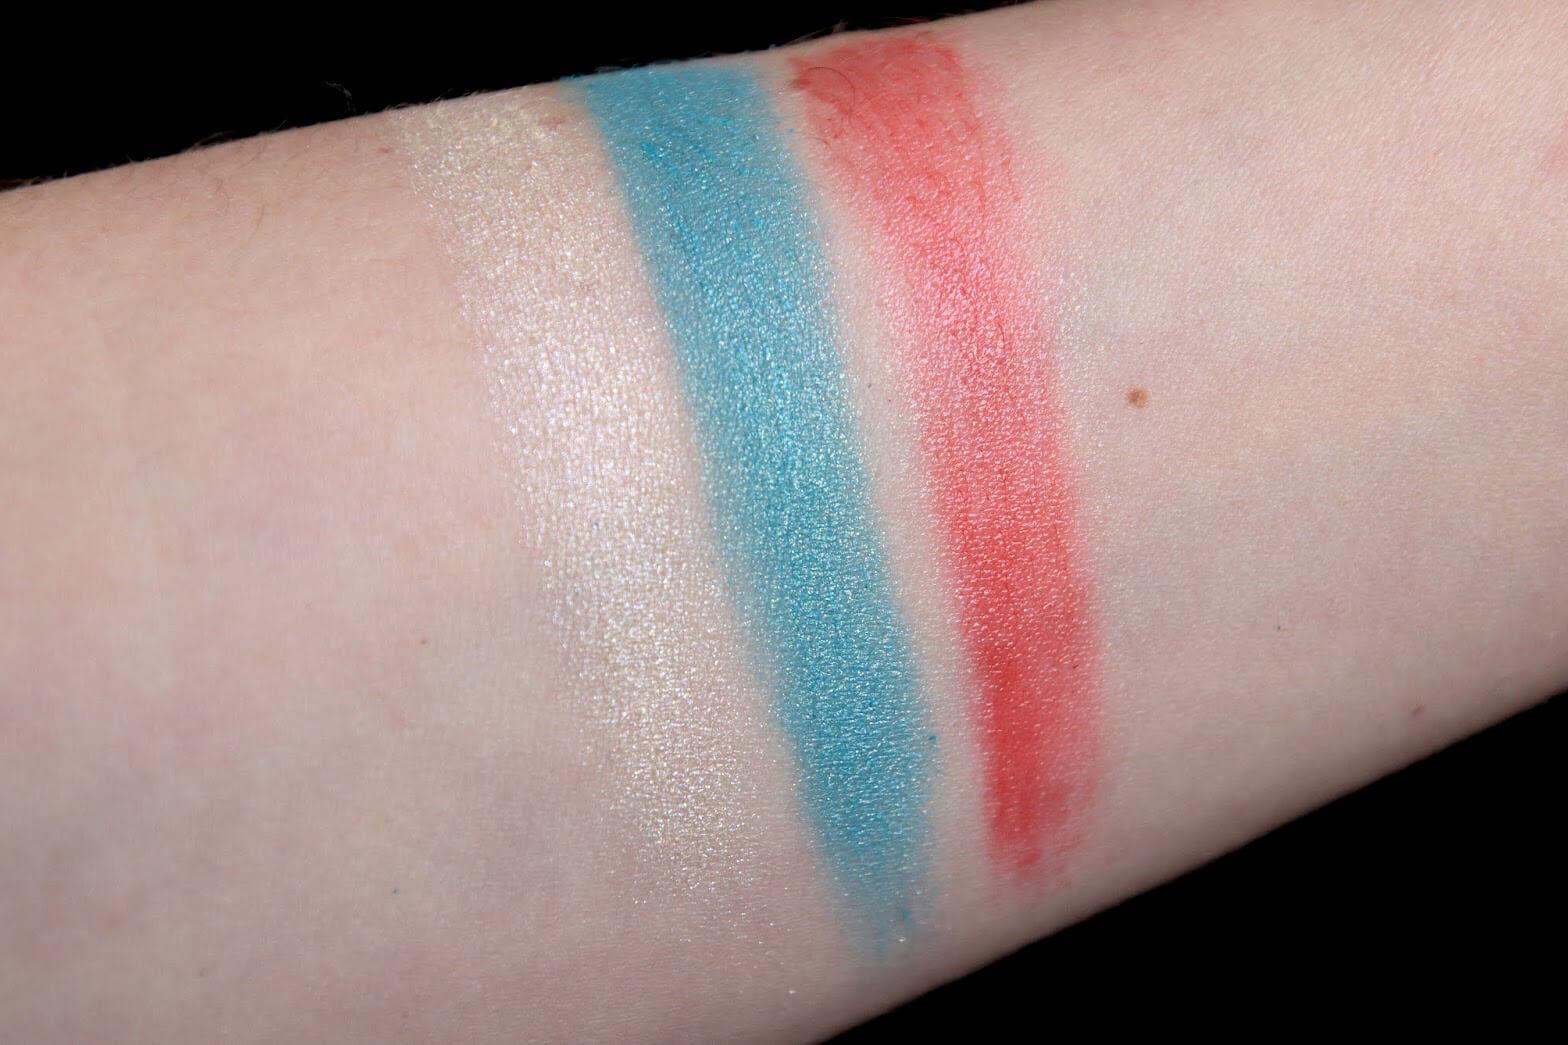 Paul Joe Sparkling Eye Color 002 Lipstick L 400 swatch